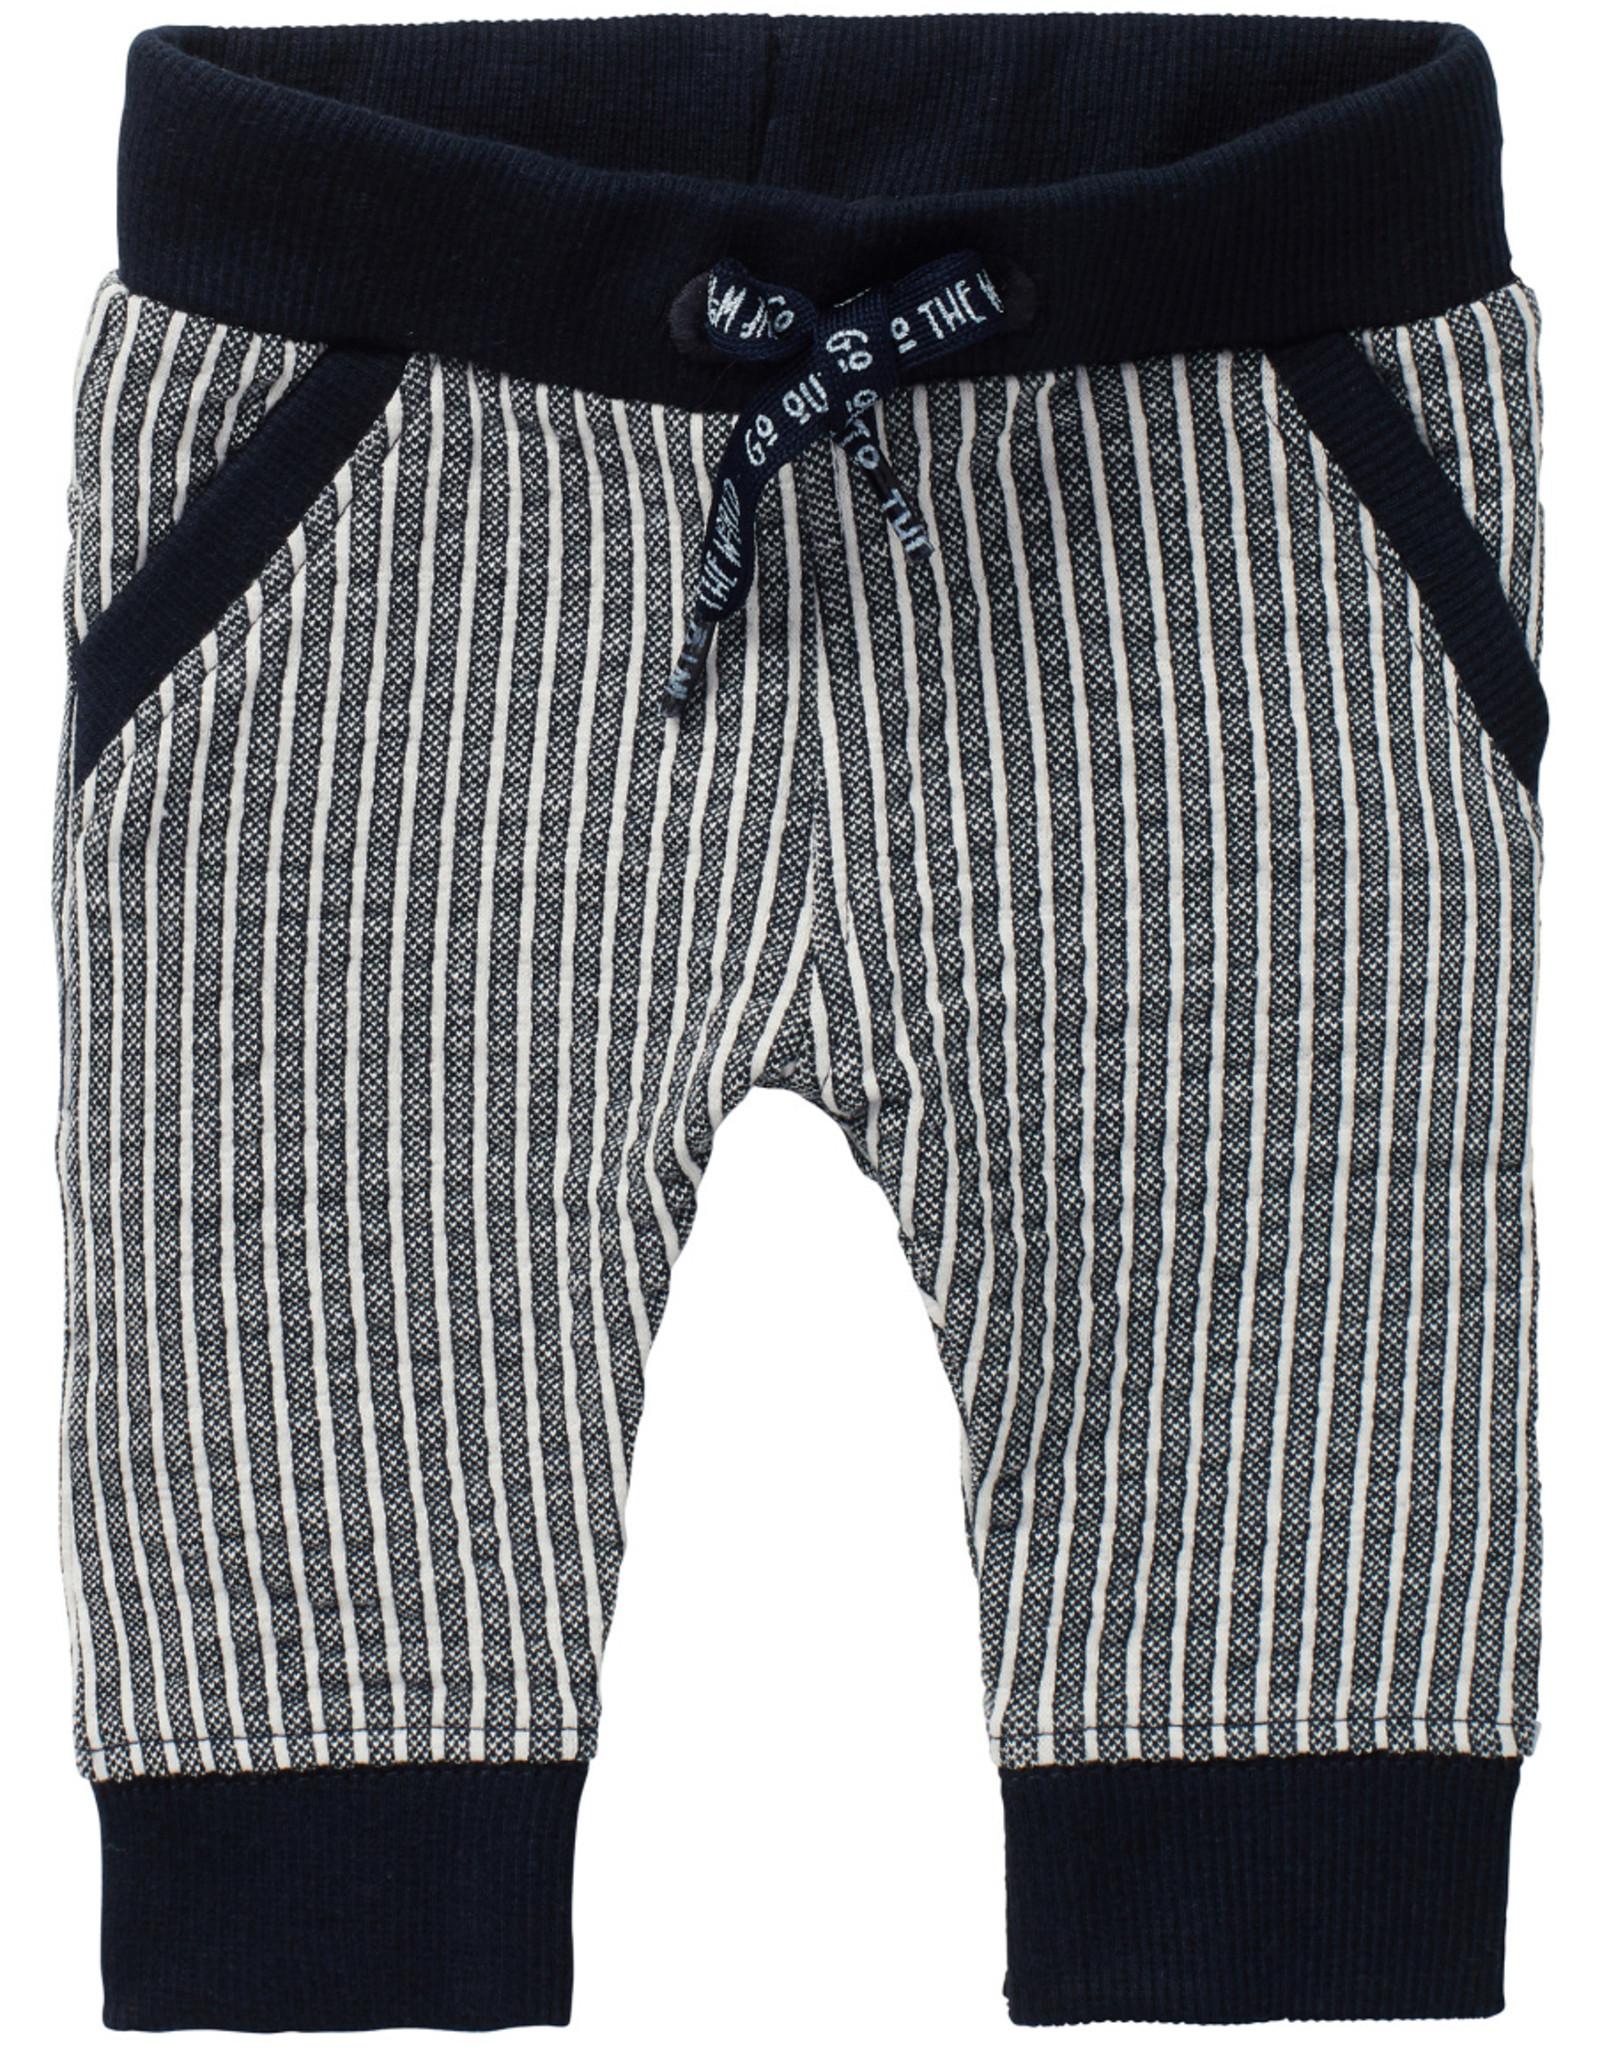 Noppies SP21 BbyB Thame Stripe Pant